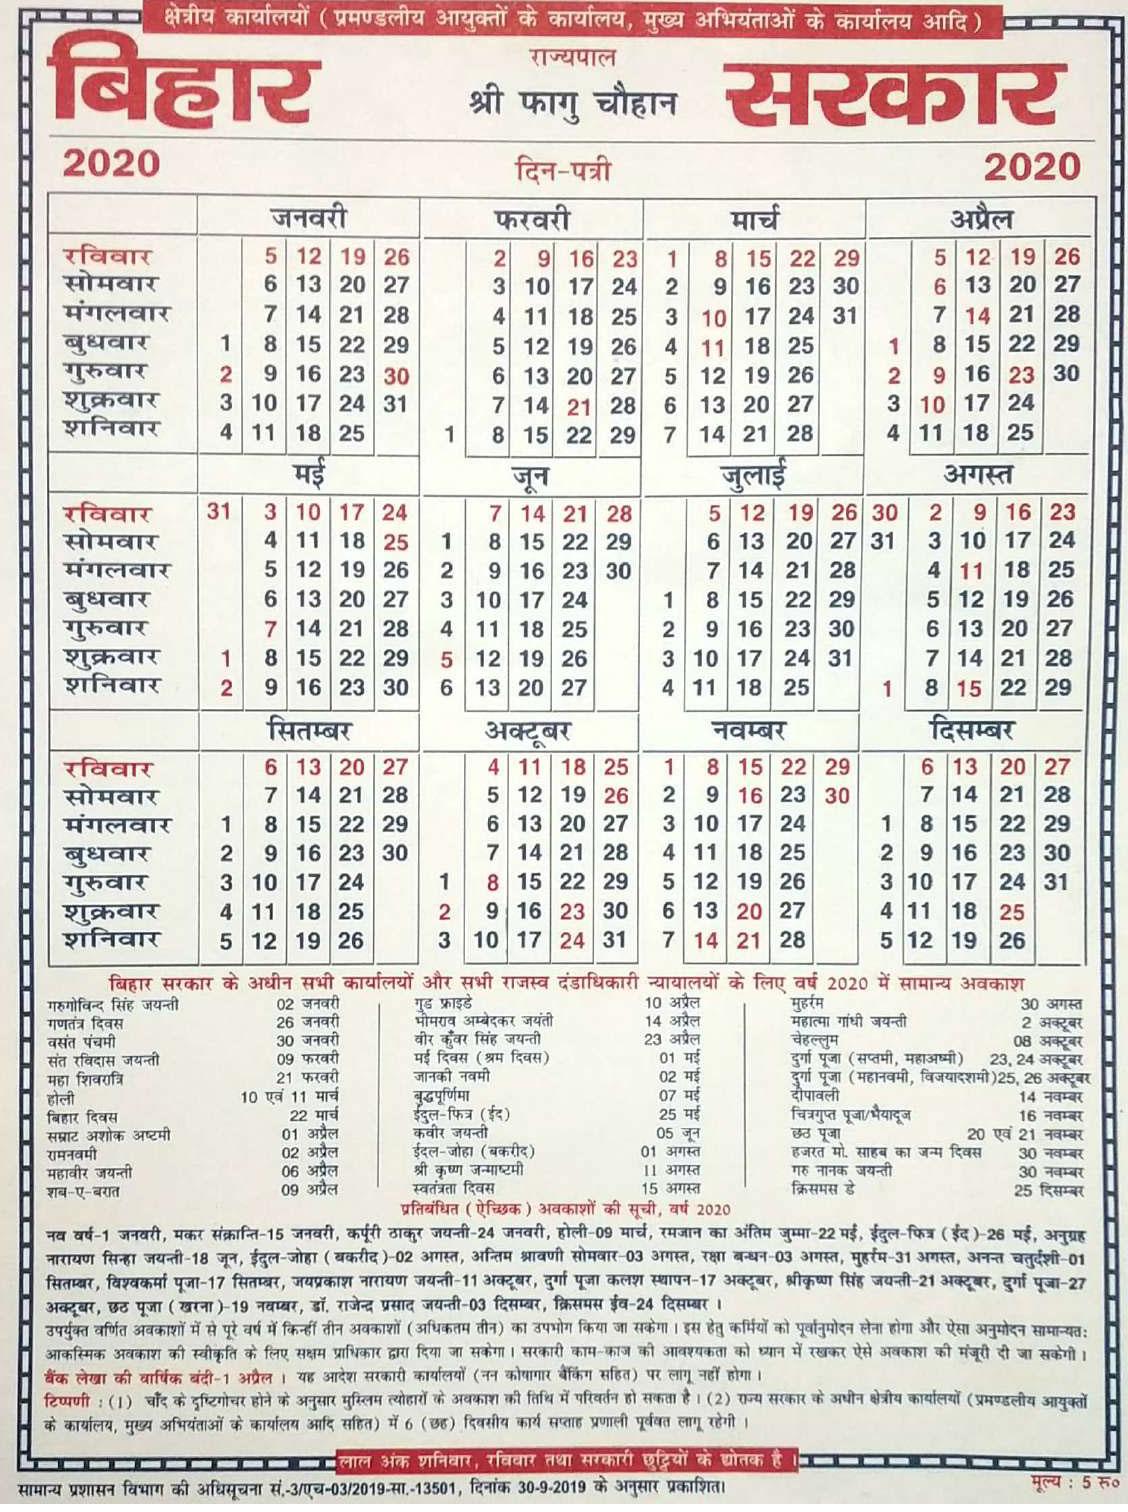 Bihar Sarkar Calendar 2021 Pdf | Seg regarding Bihar Goverment Calender